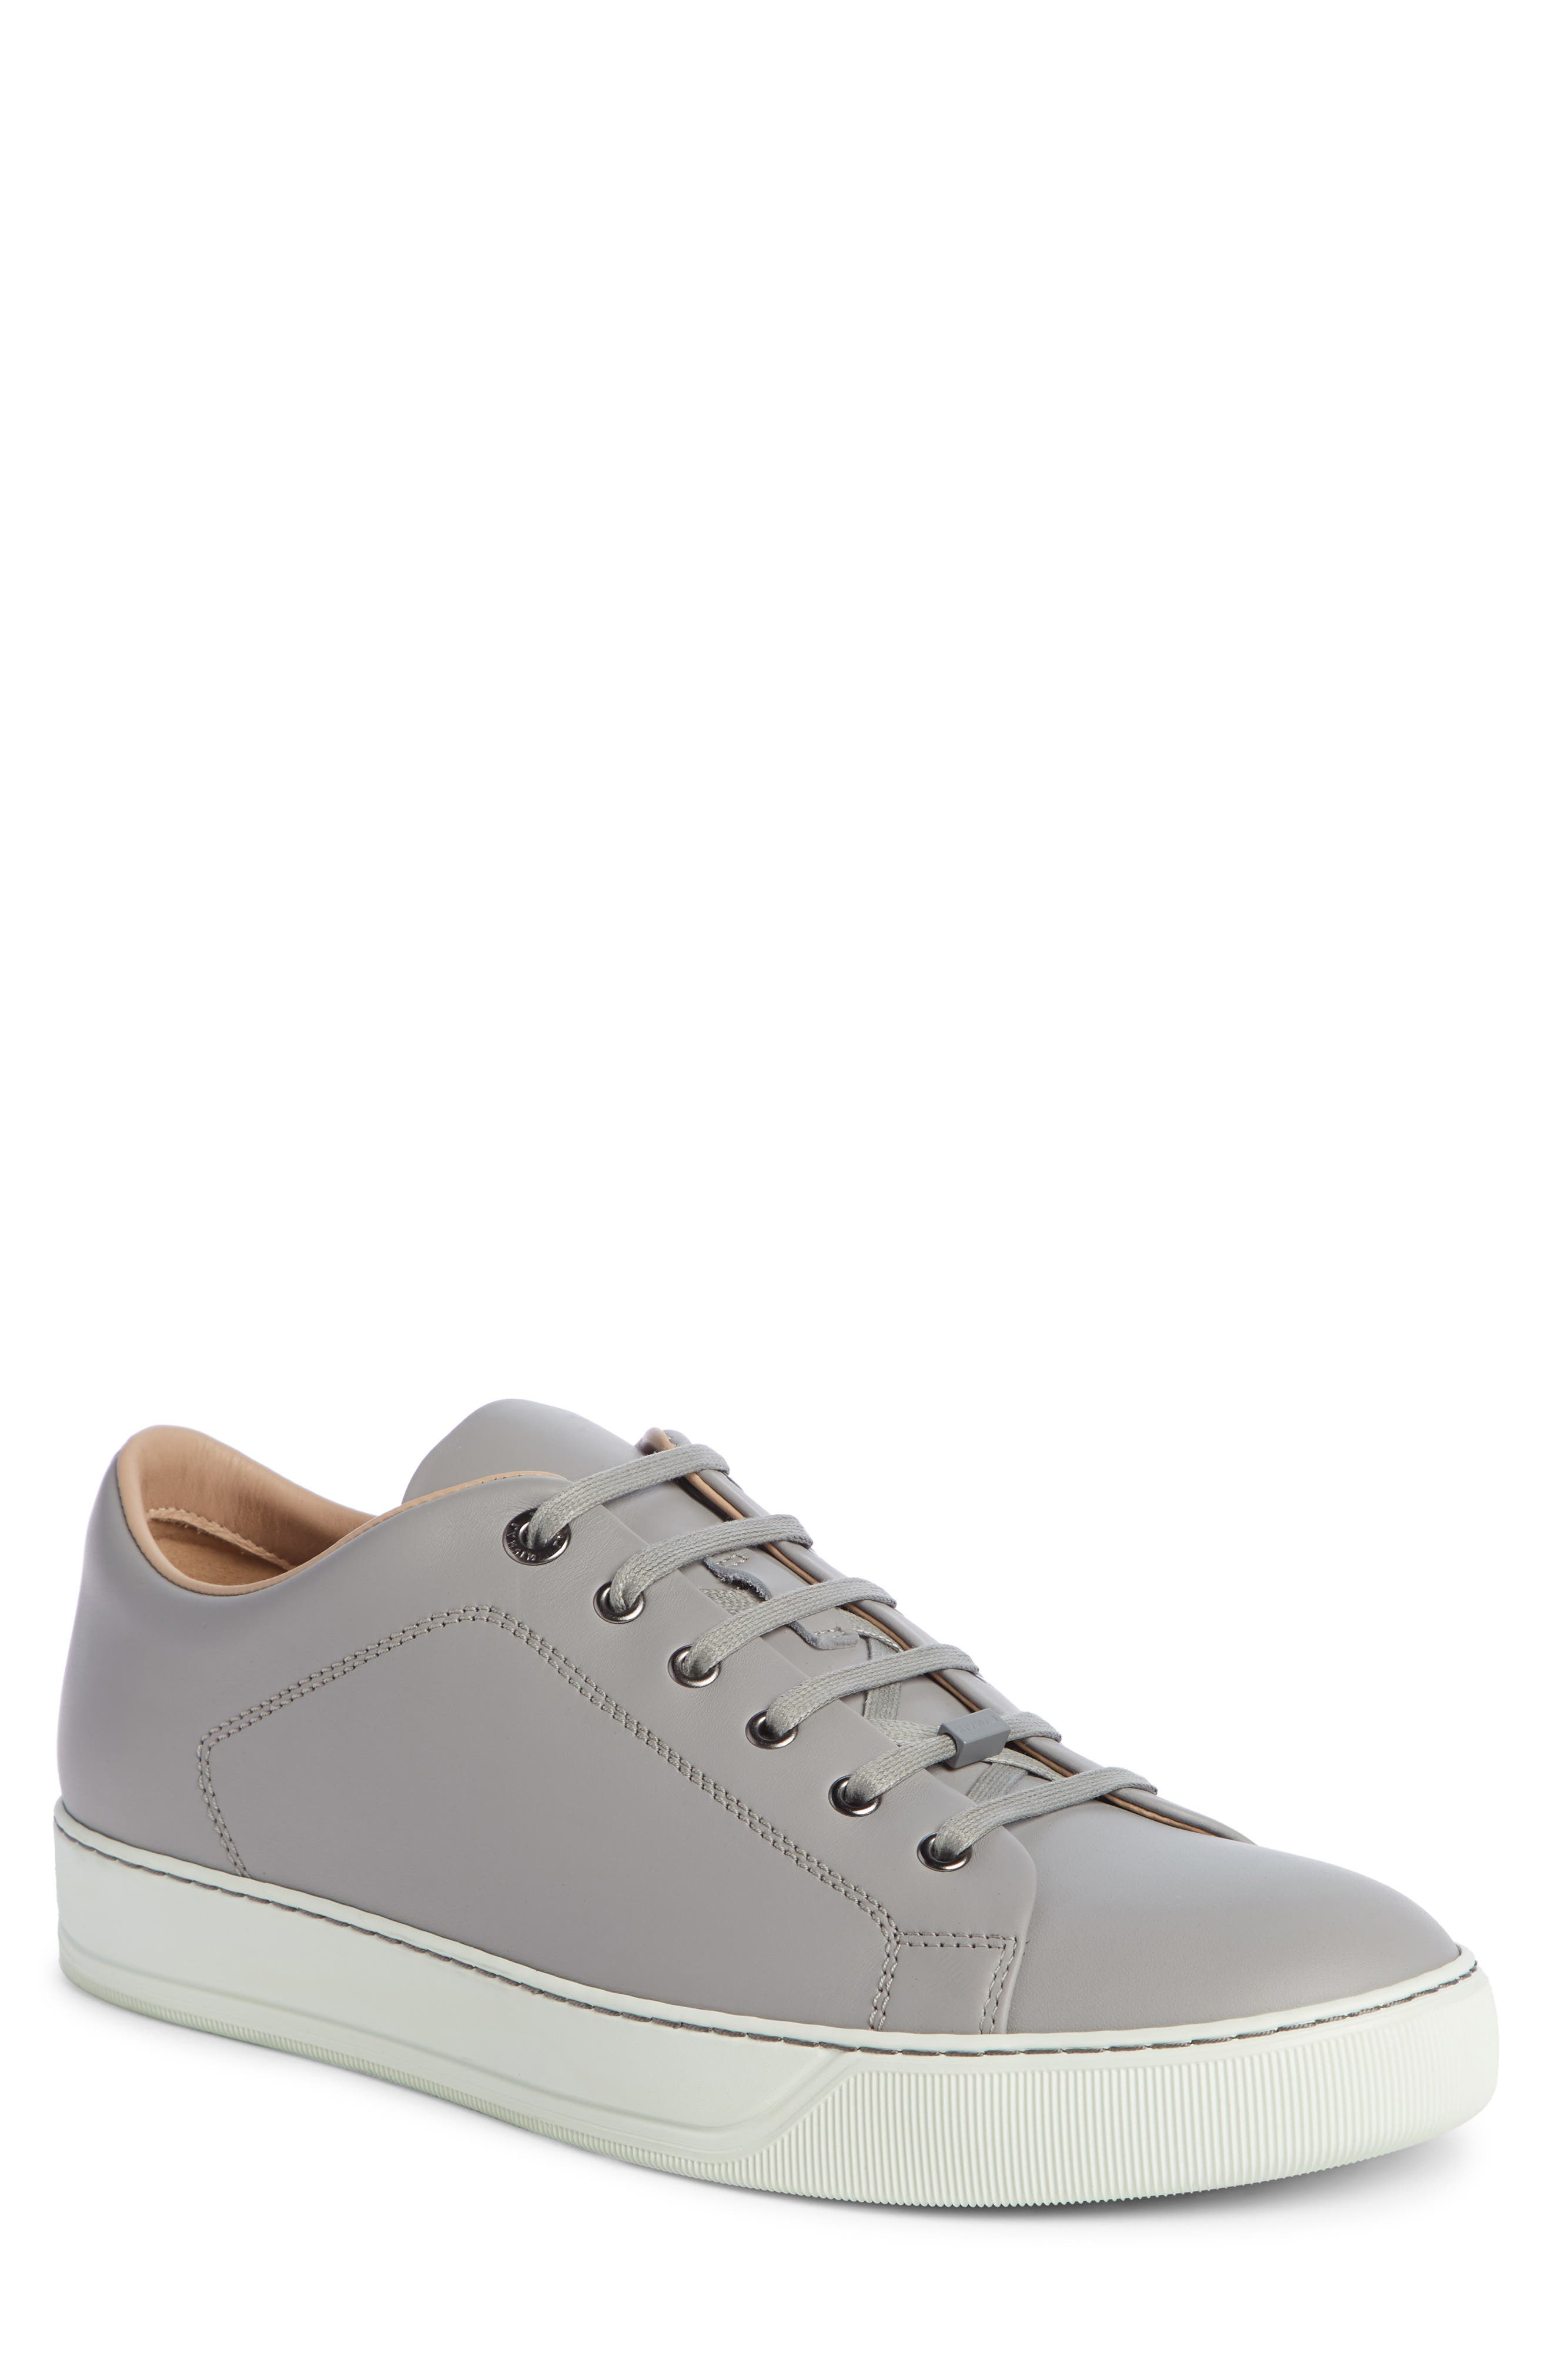 Frye Nappa Sneaker,                             Main thumbnail 1, color,                             022